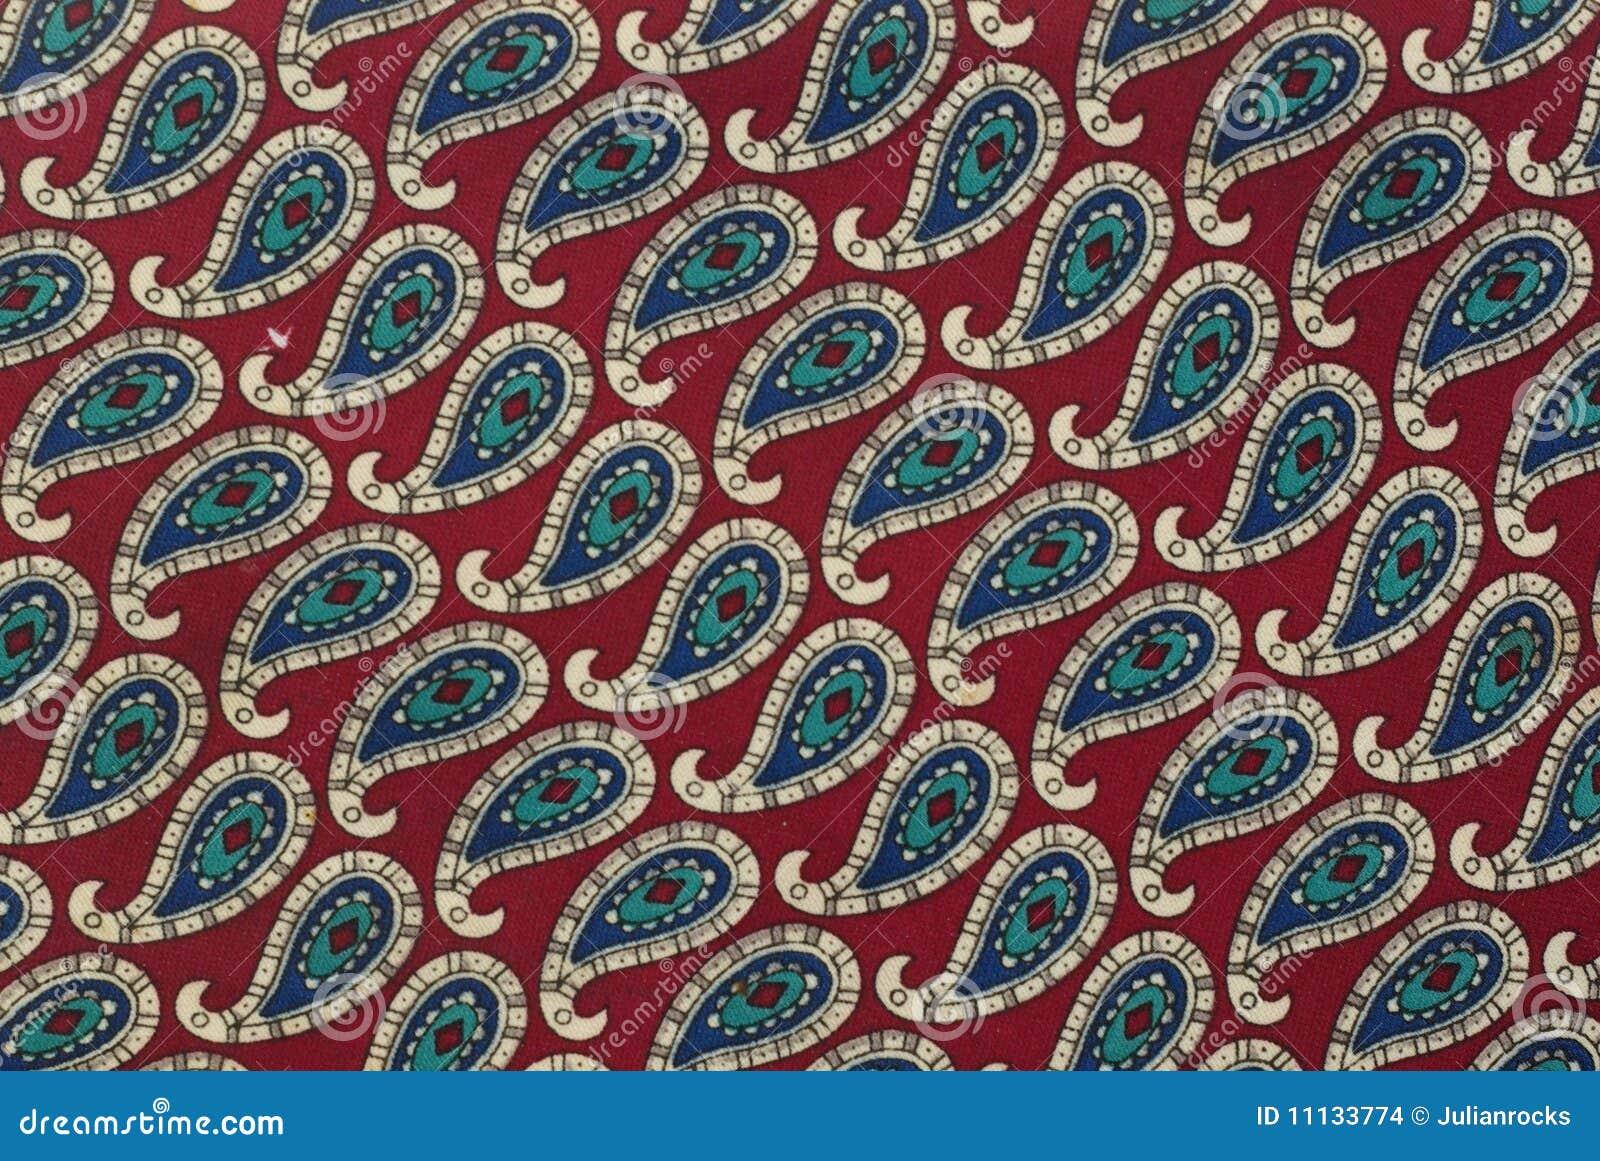 Textura Roja De La Tela Foto De Archivo. Imagen De Paño